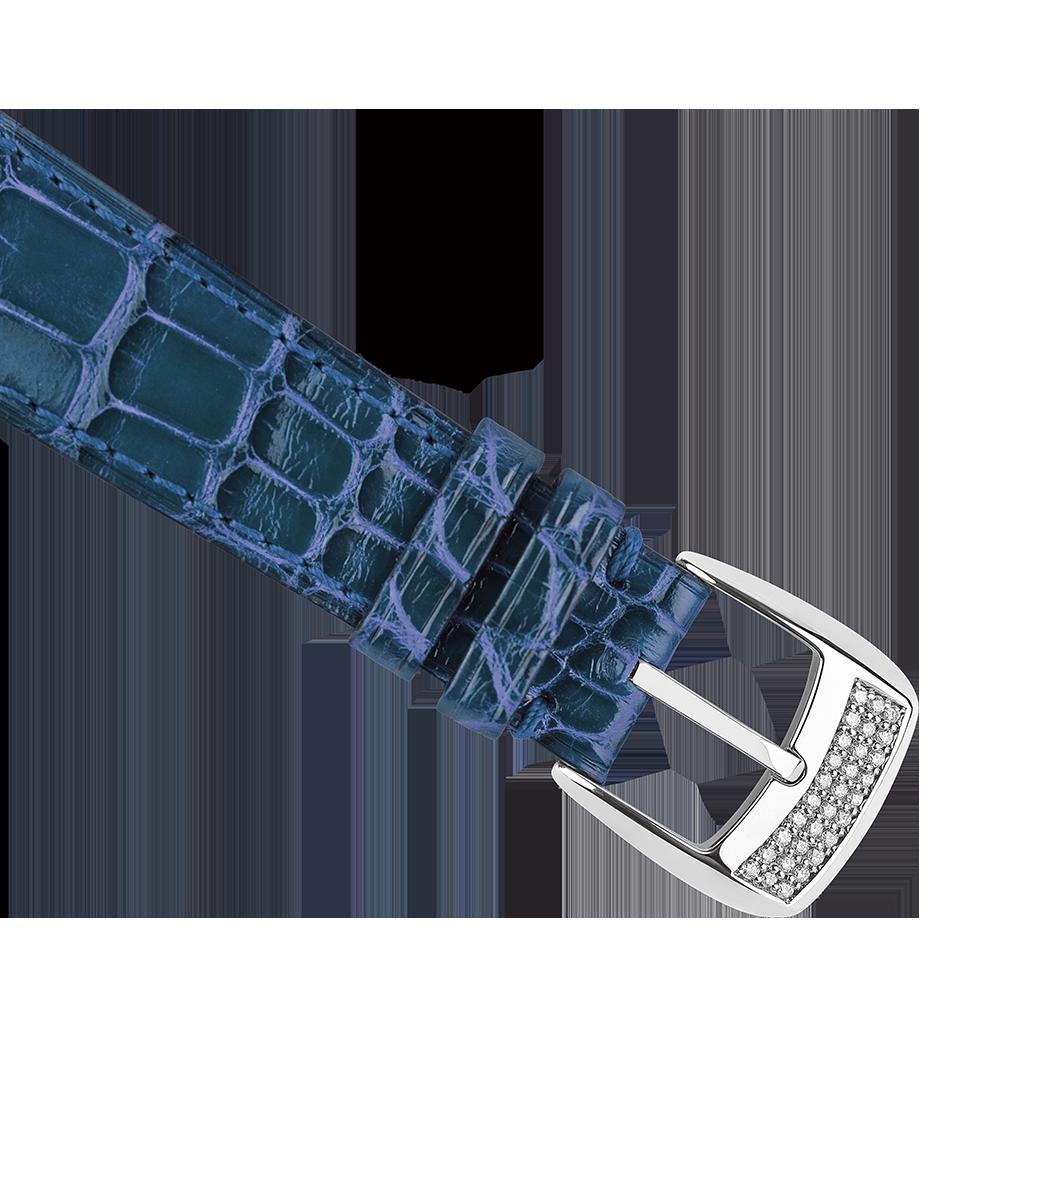 Regent 1609 AD 4047 limited edition diamond watch blue alligator strap